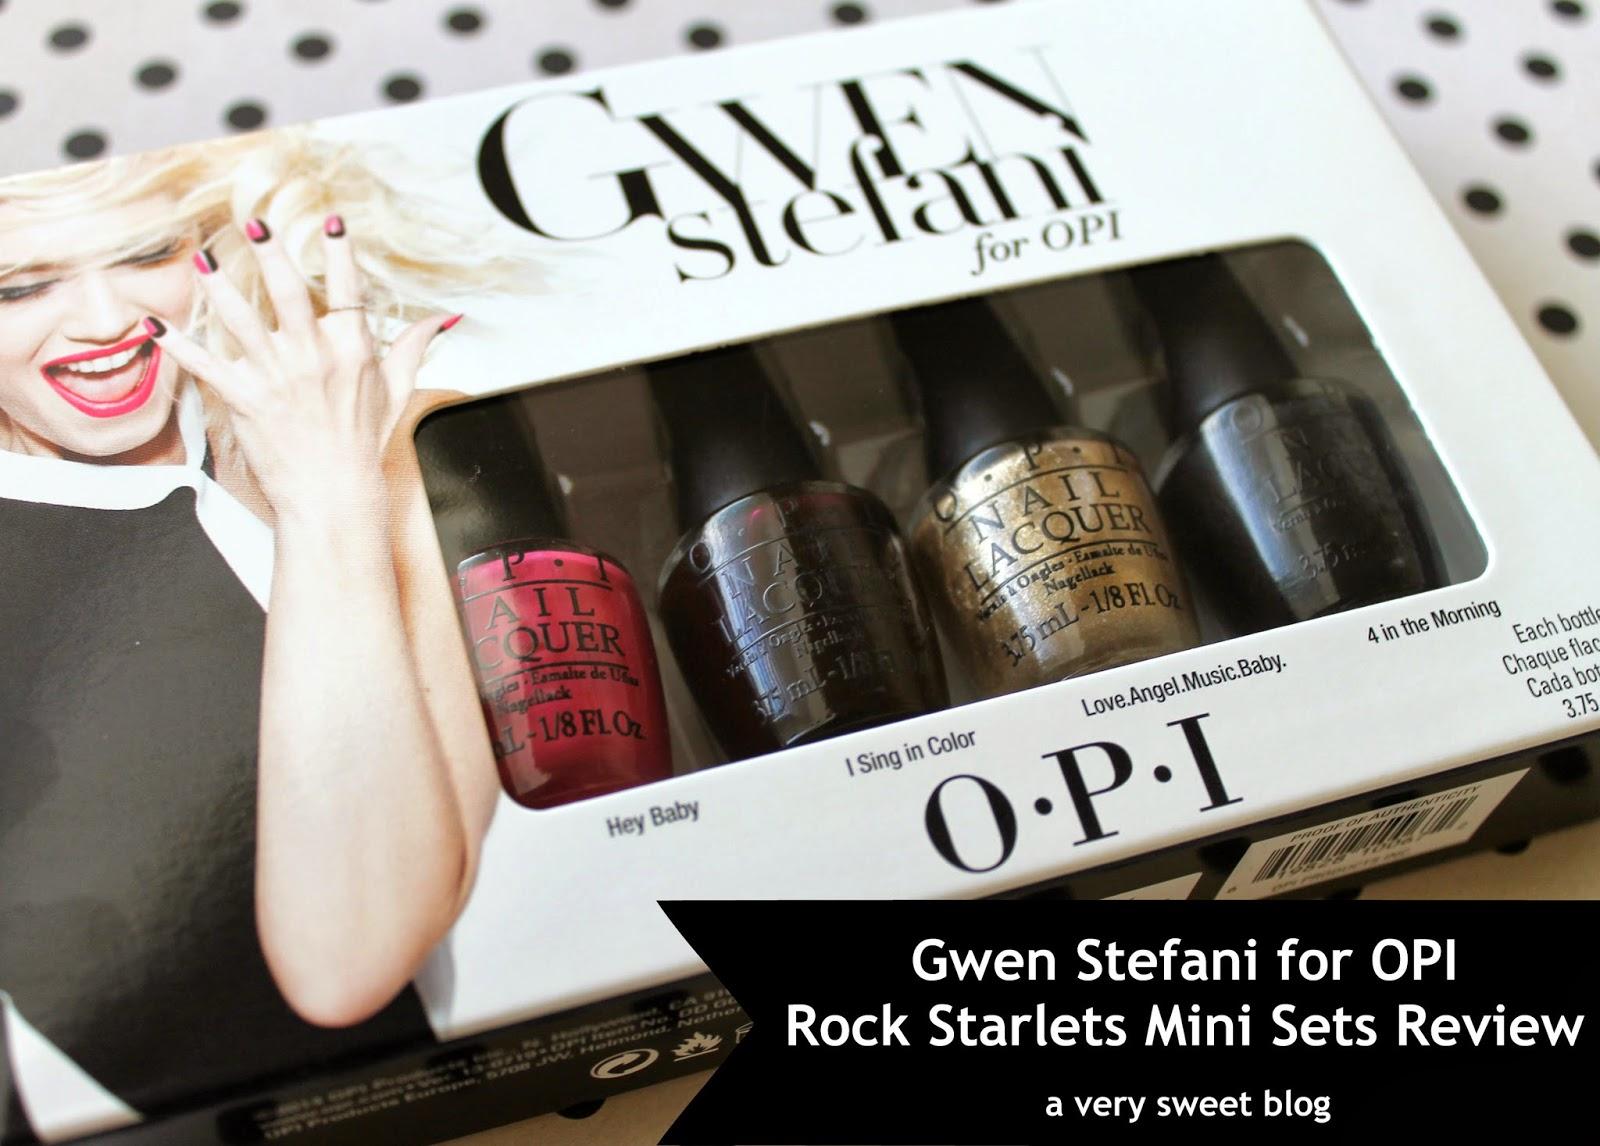 Gwen Stefani For OPI: Rock Starlets Mini Sets Review | A Very Sweet Blog